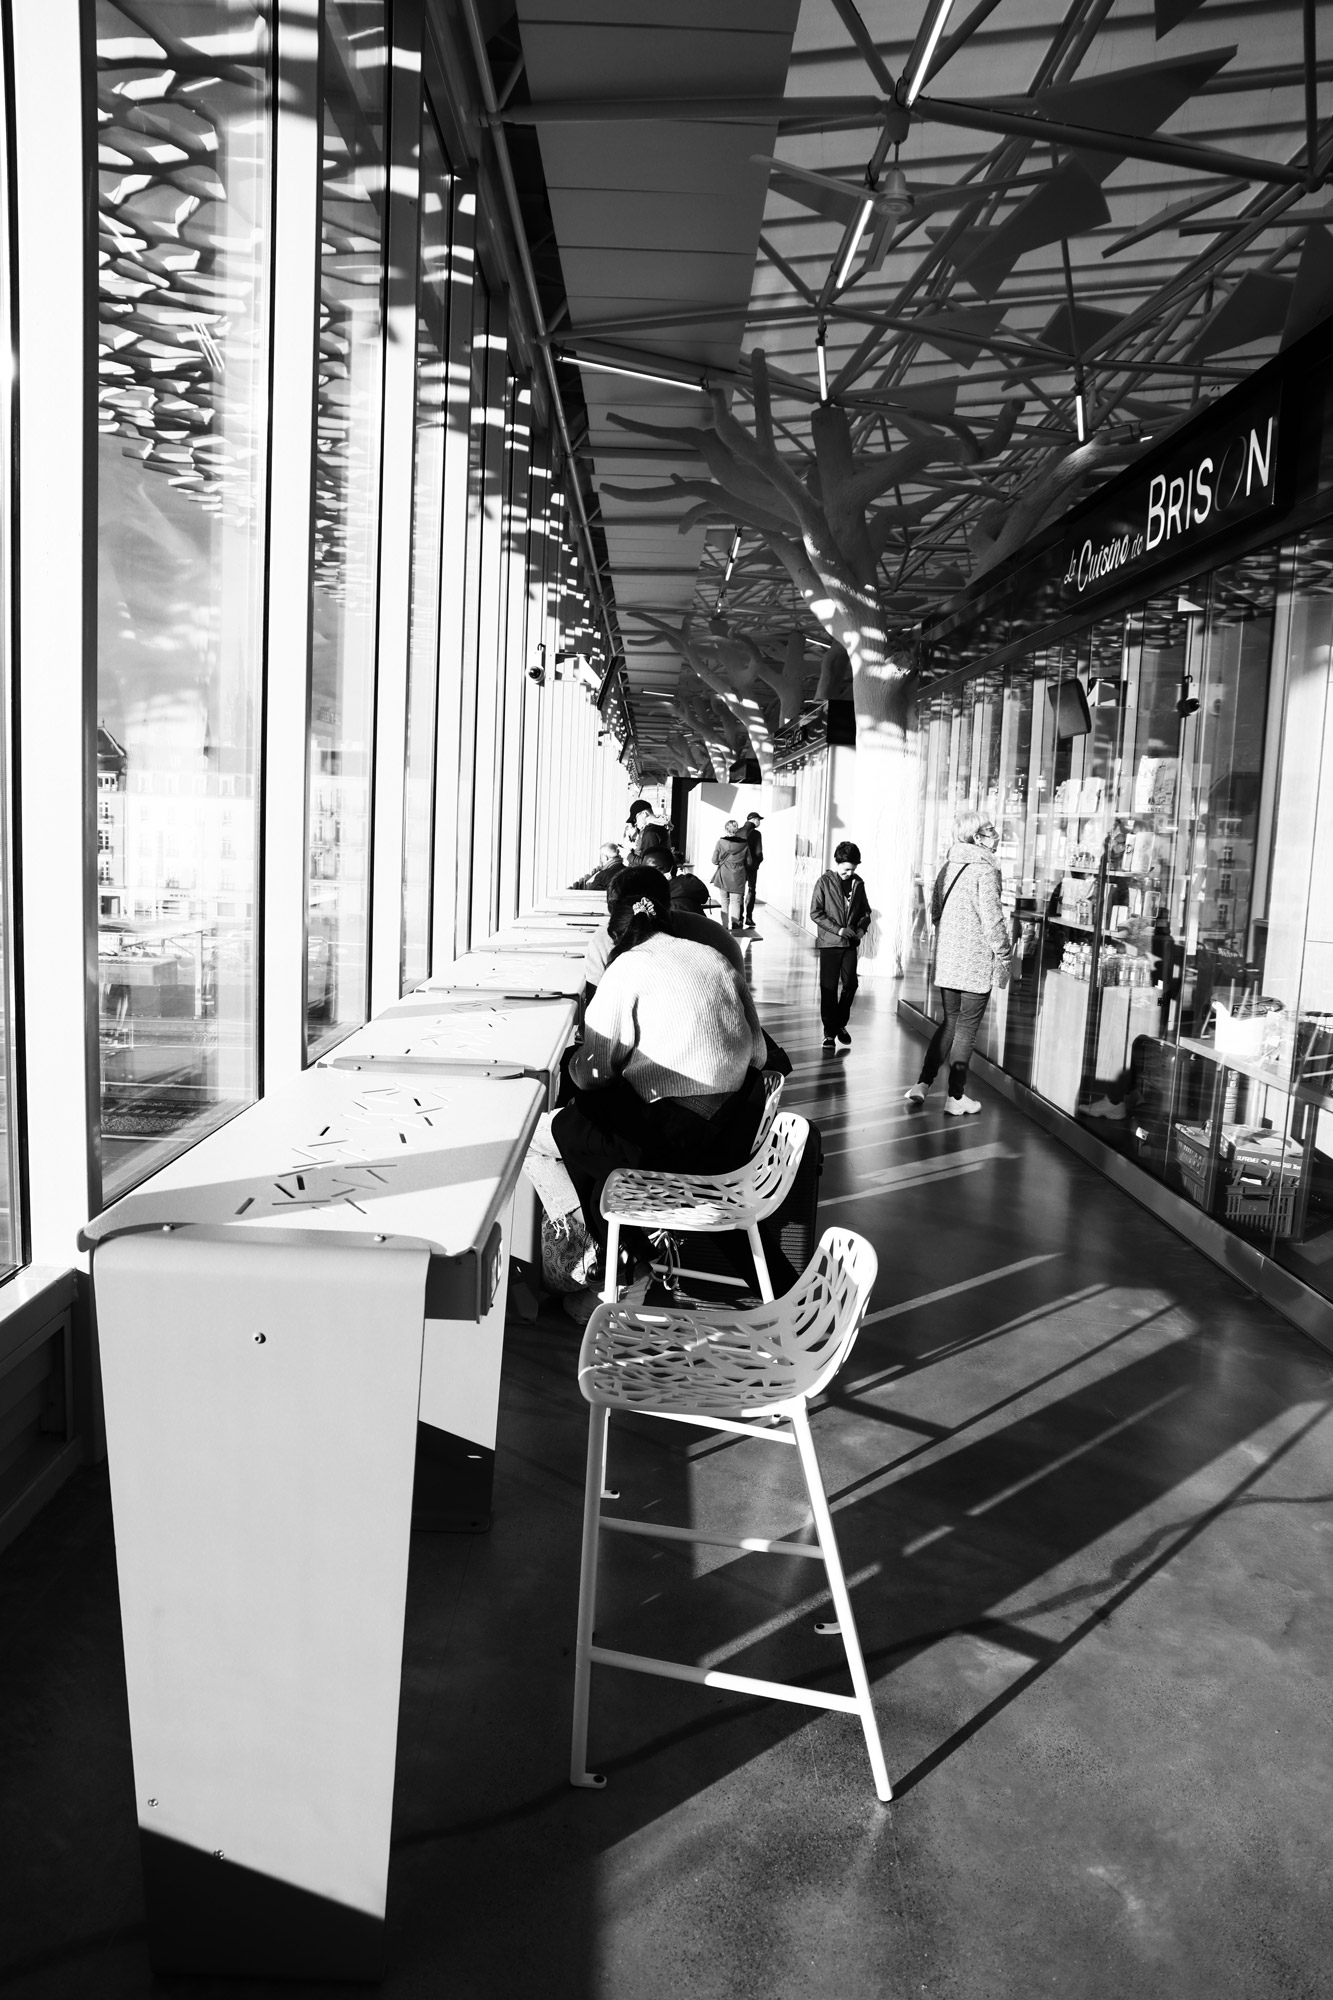 """Departure in perspective"" - Gare de Nantes. ©Clémence Rougetet"